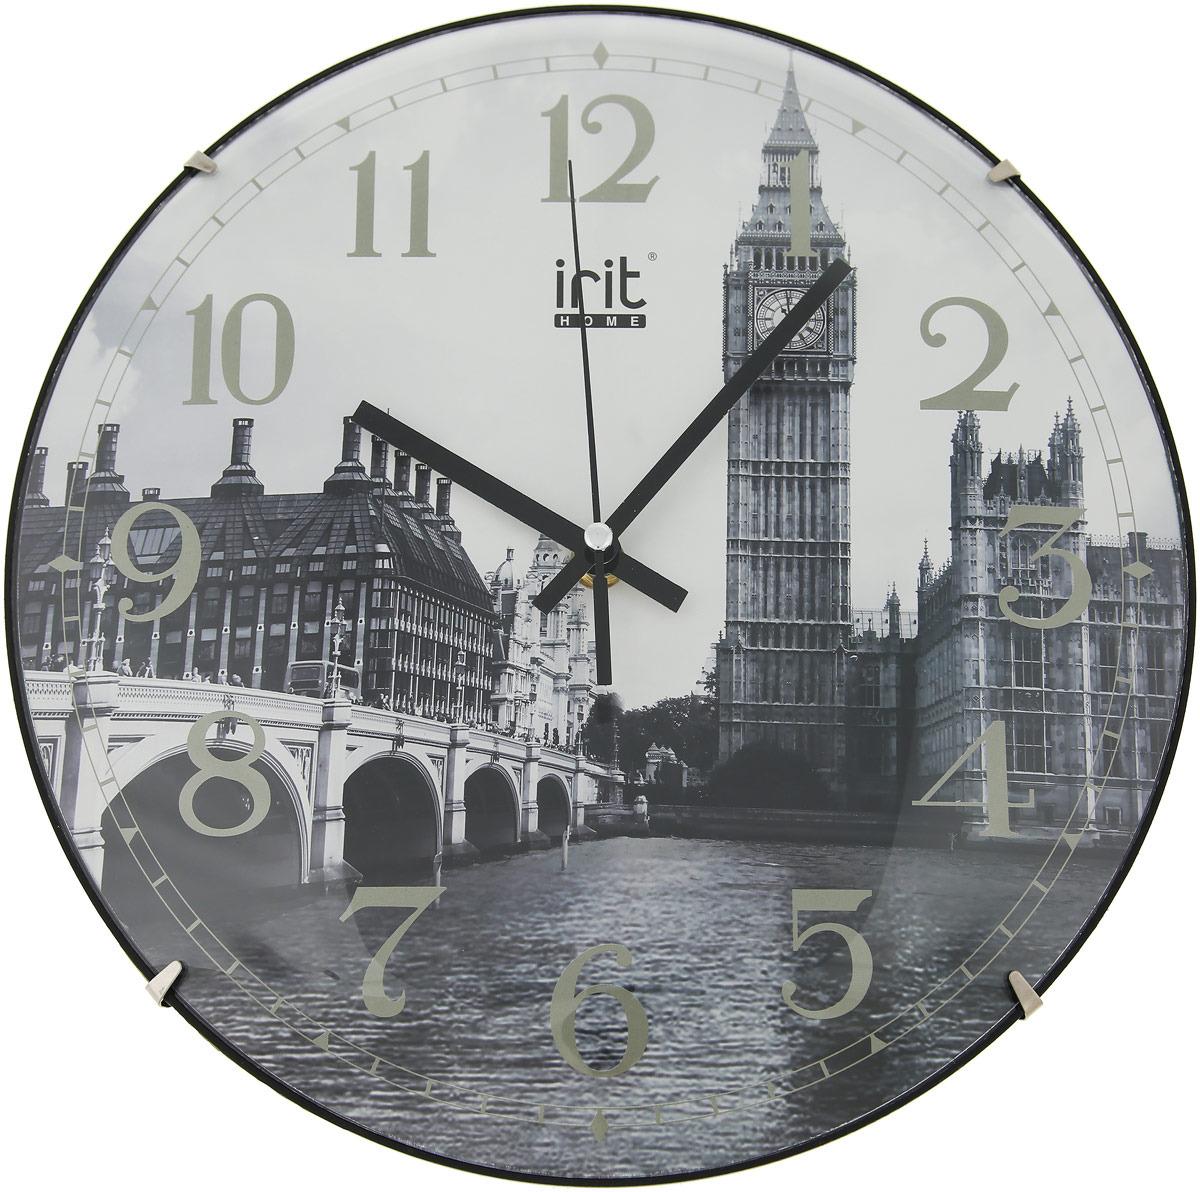 "Настенные часы Irit IR-649 ""Англия"", кварцевые, диаметр 30 см"